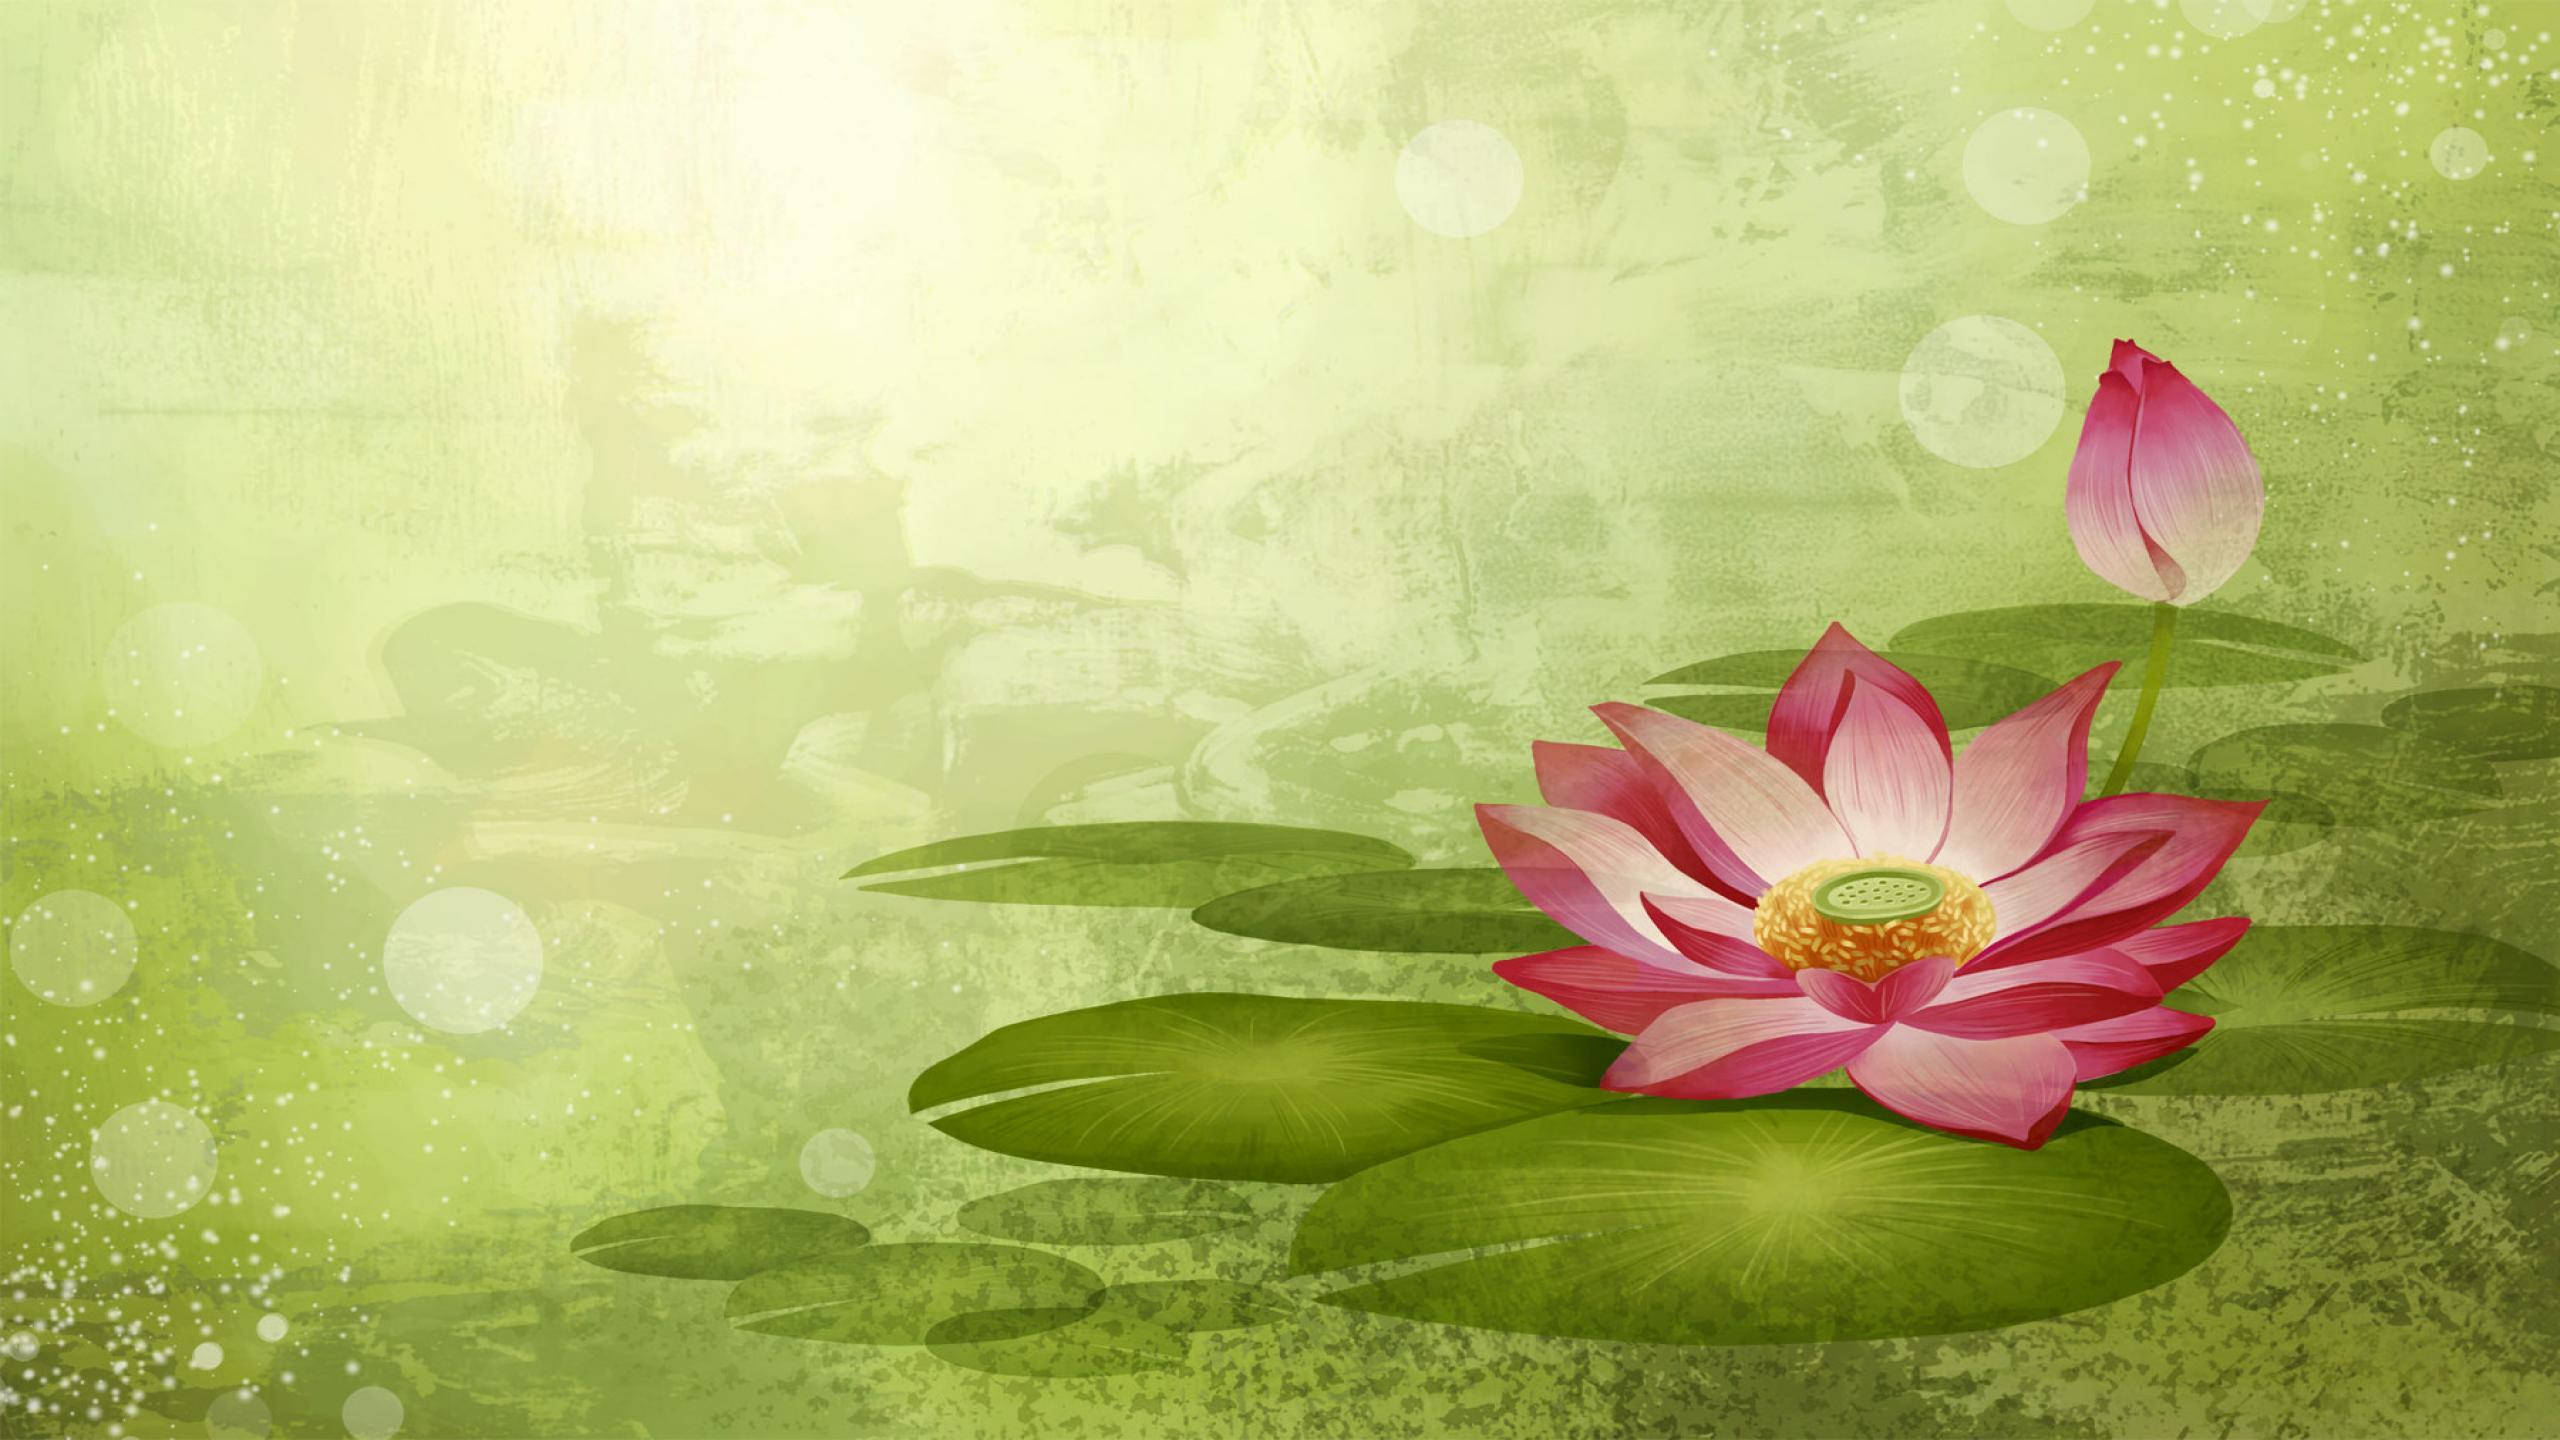 Lotus flower shop images flower wallpaper hd yellow lotus flower flowers gallery lotus flower shop izmirmasajfo images mightylinksfo